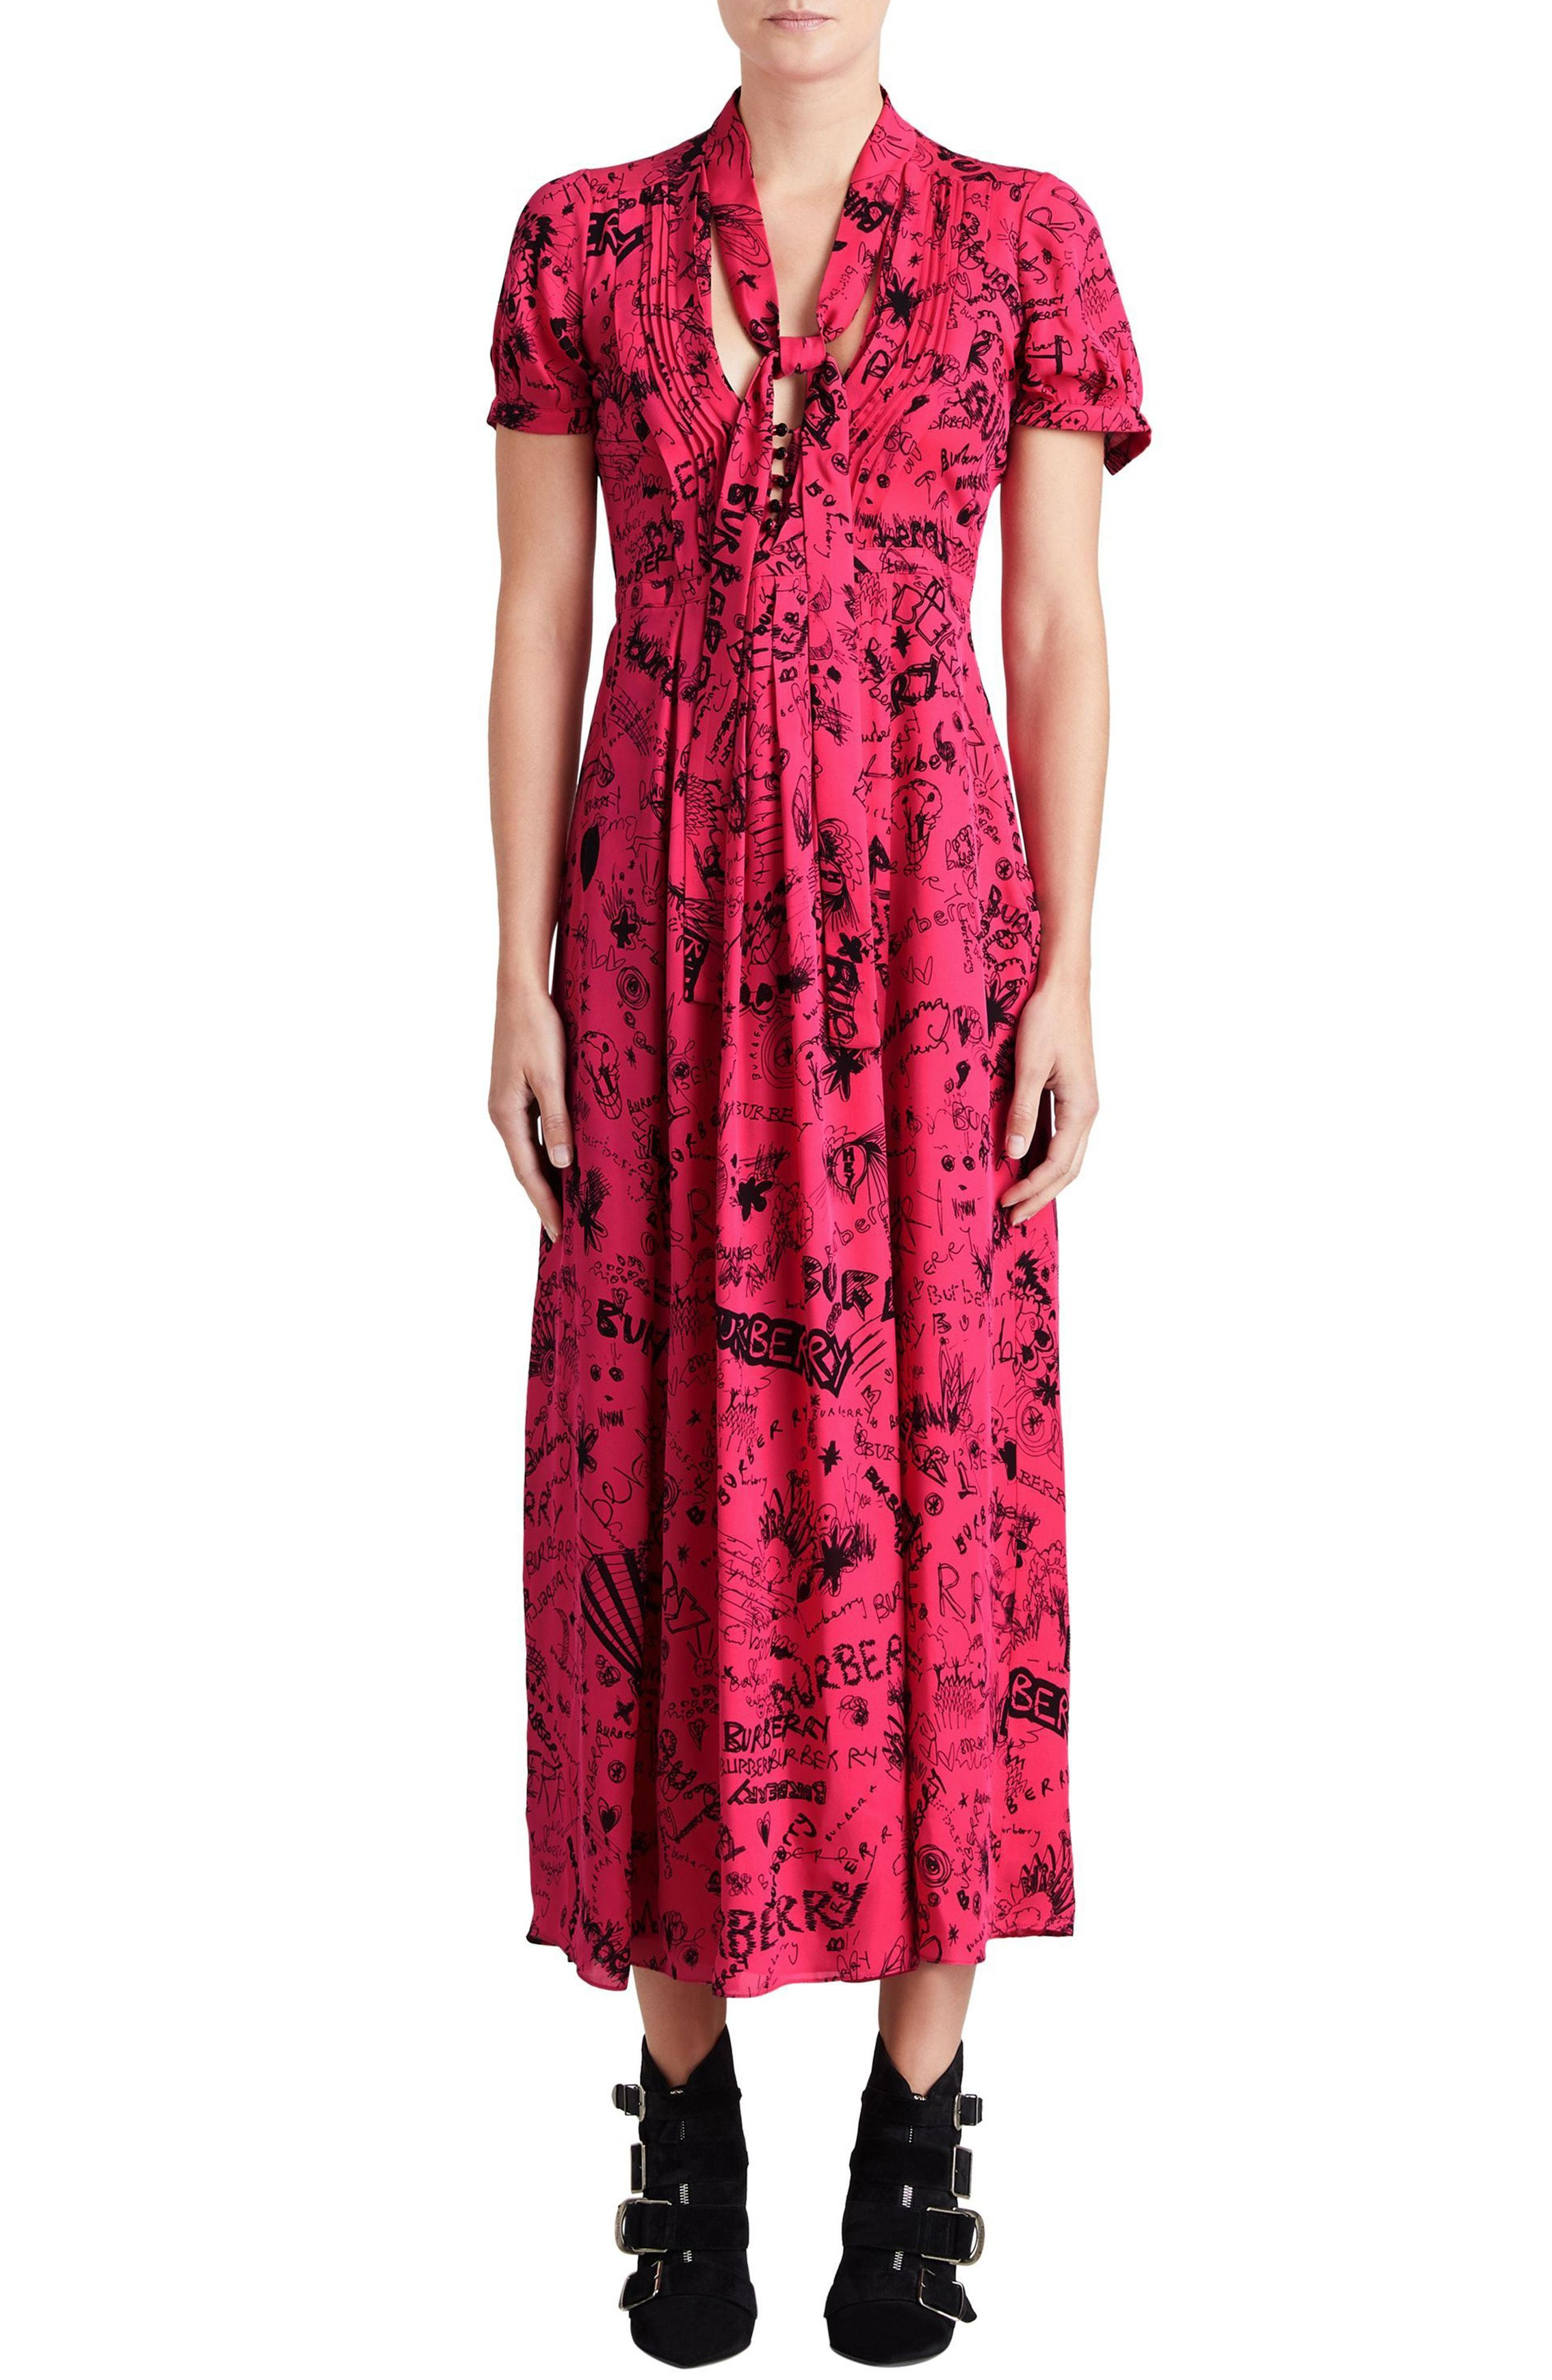 04079f51fd0 Burberry Antoniana Doodle Dress In Mulberry Silk In Magenta